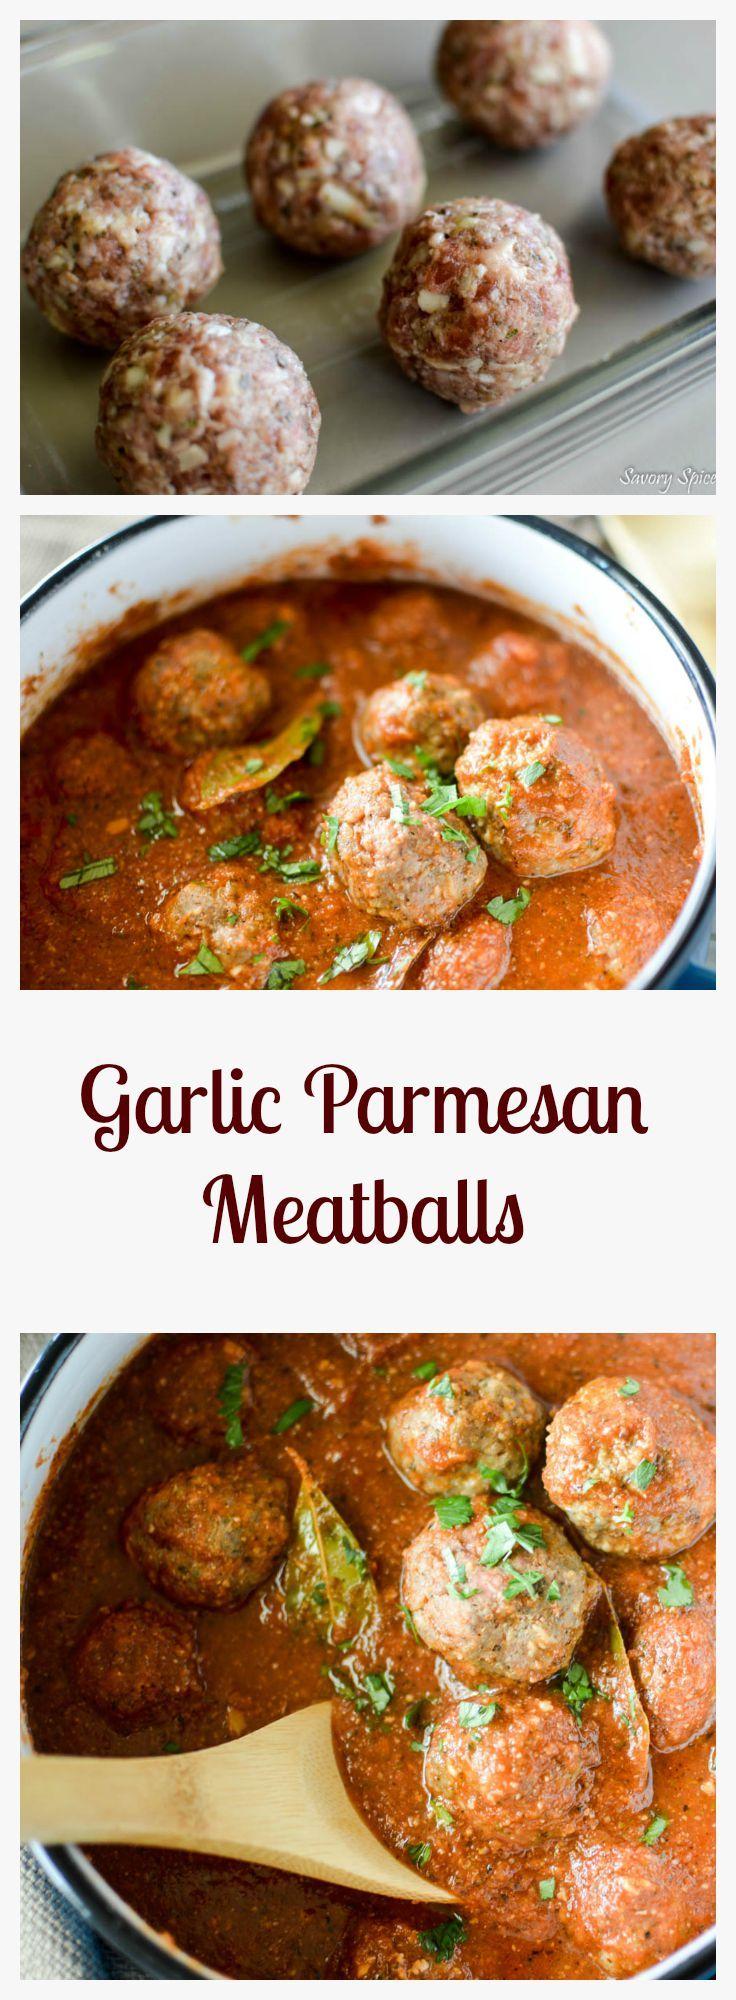 Delicious Garlic Parmesan Meatballs. Freezer Friendly for menu planning.